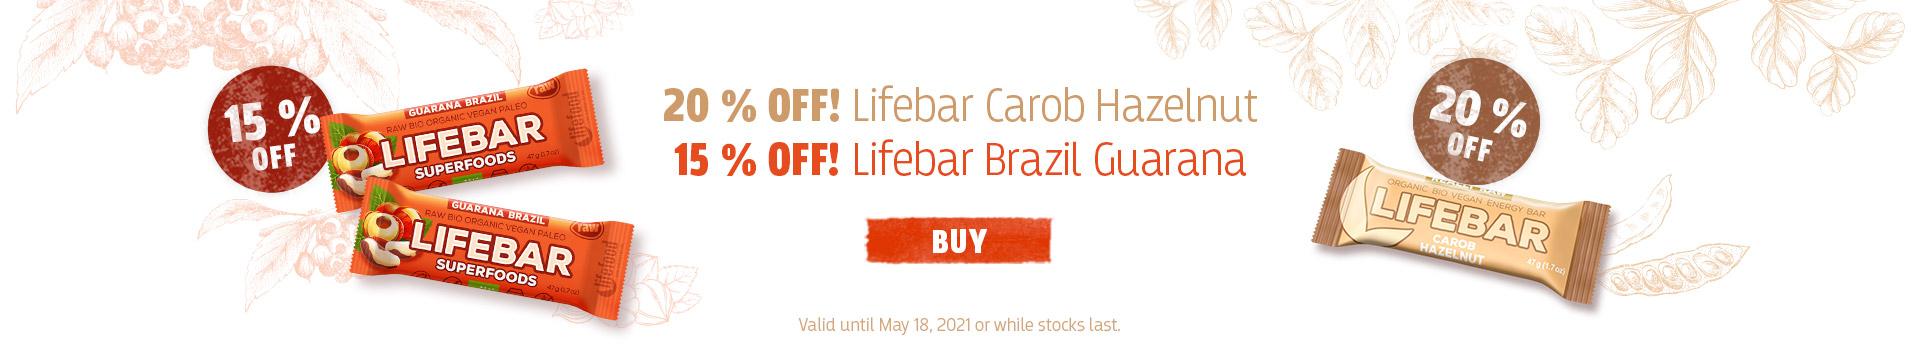 Lifebars